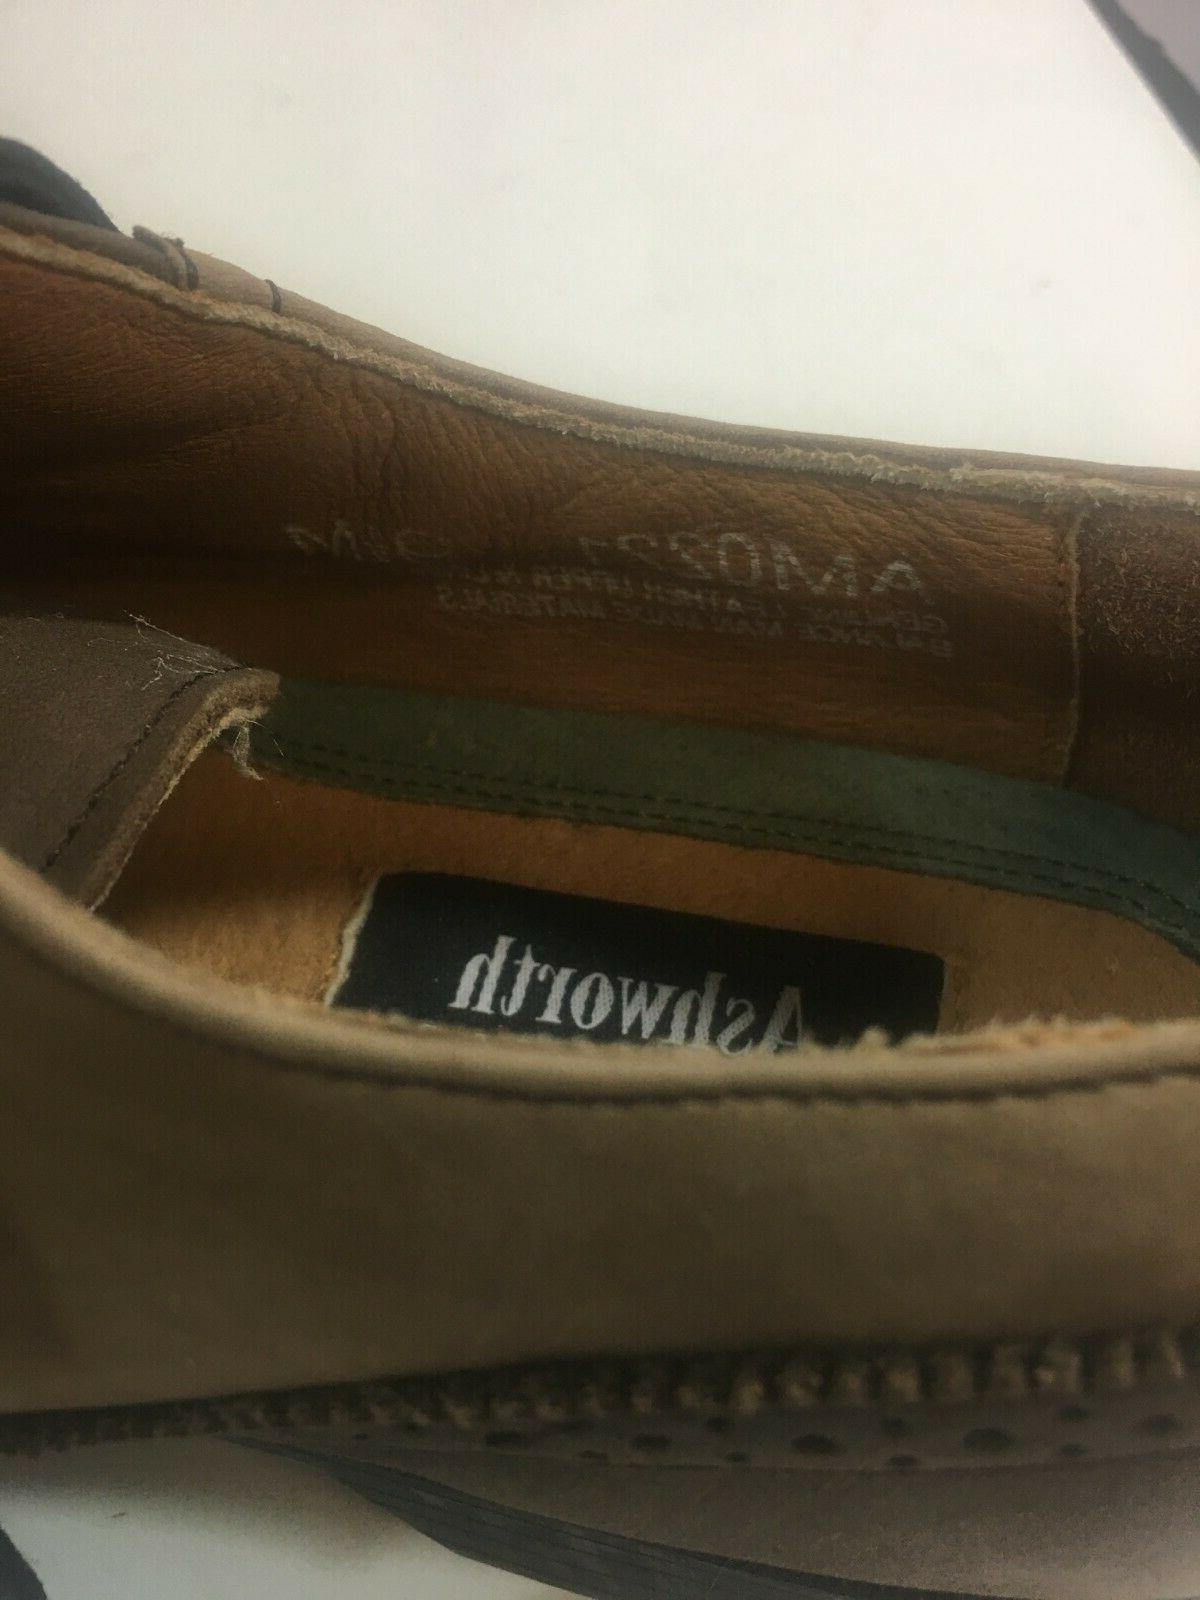 Ashworth 9.5 Brown Wing Tip Golf